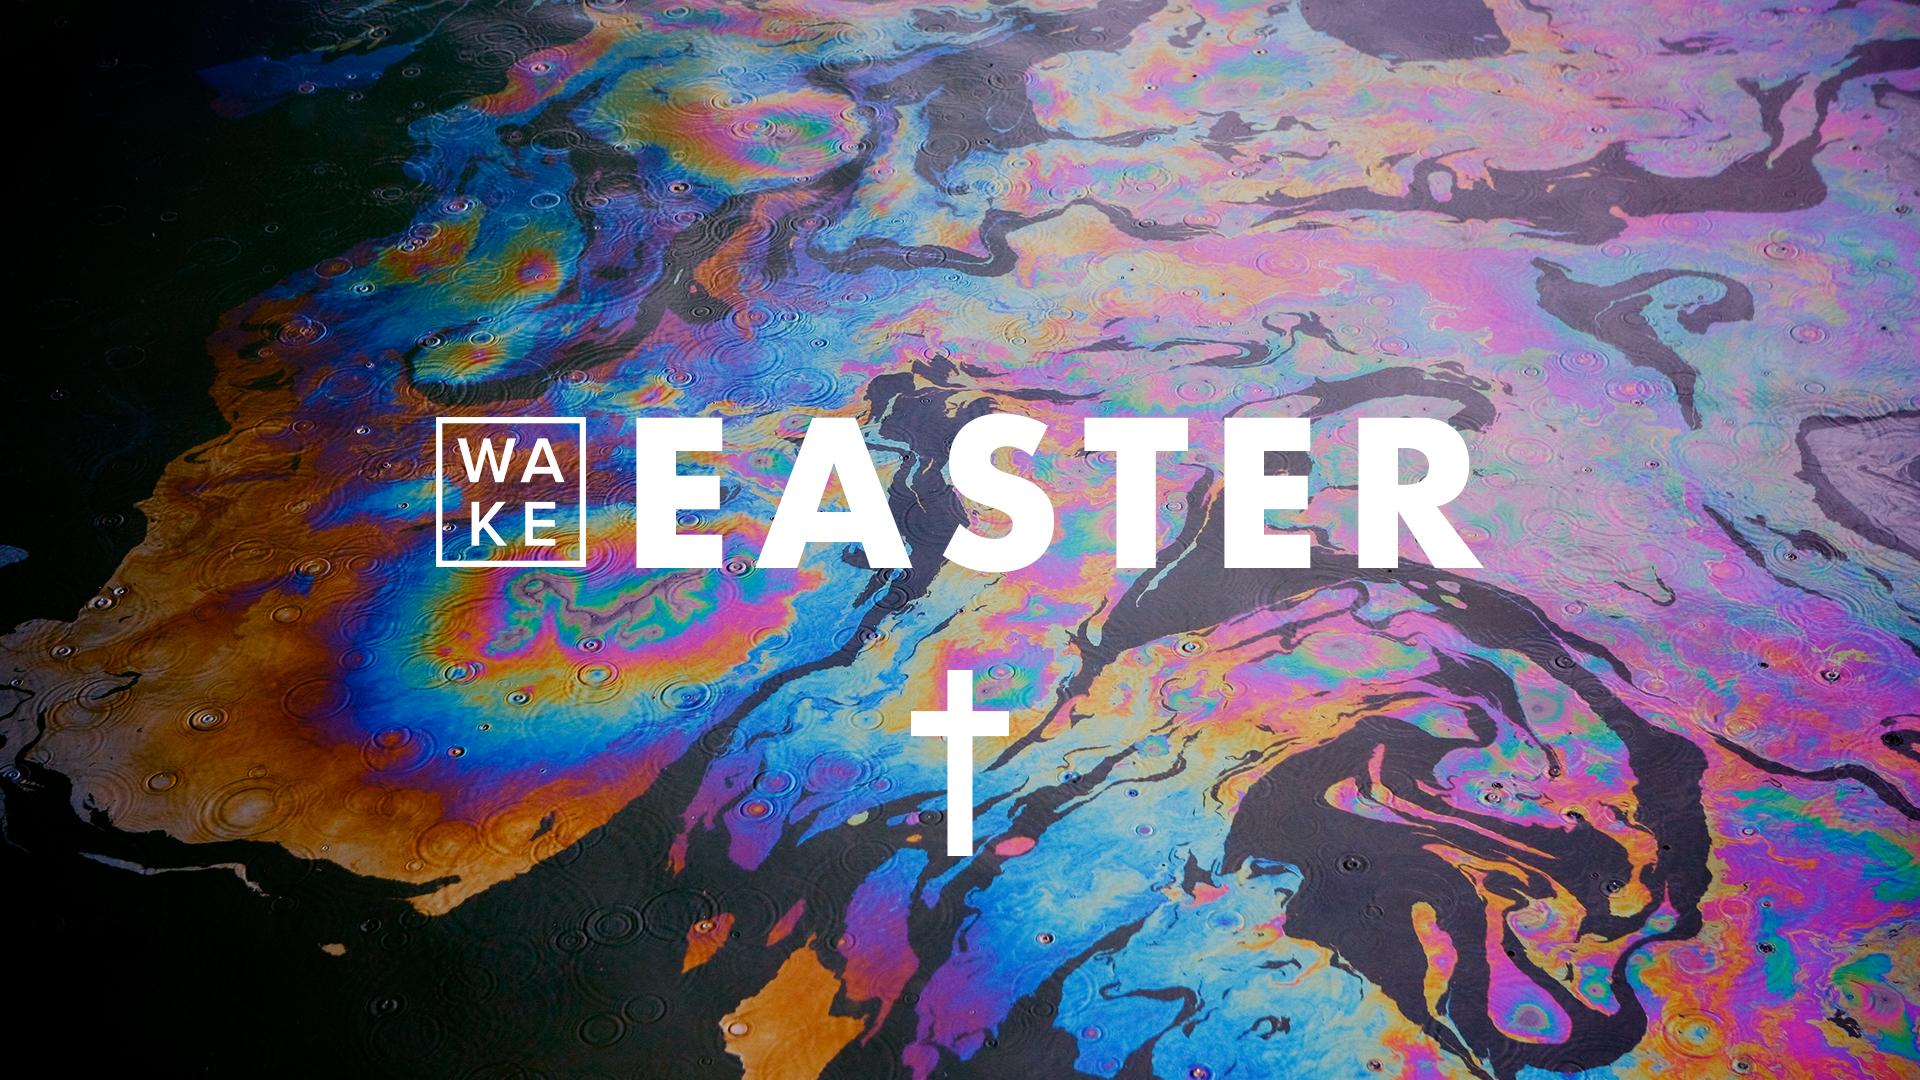 WAKE_Easter_2019_Swirls.jpg